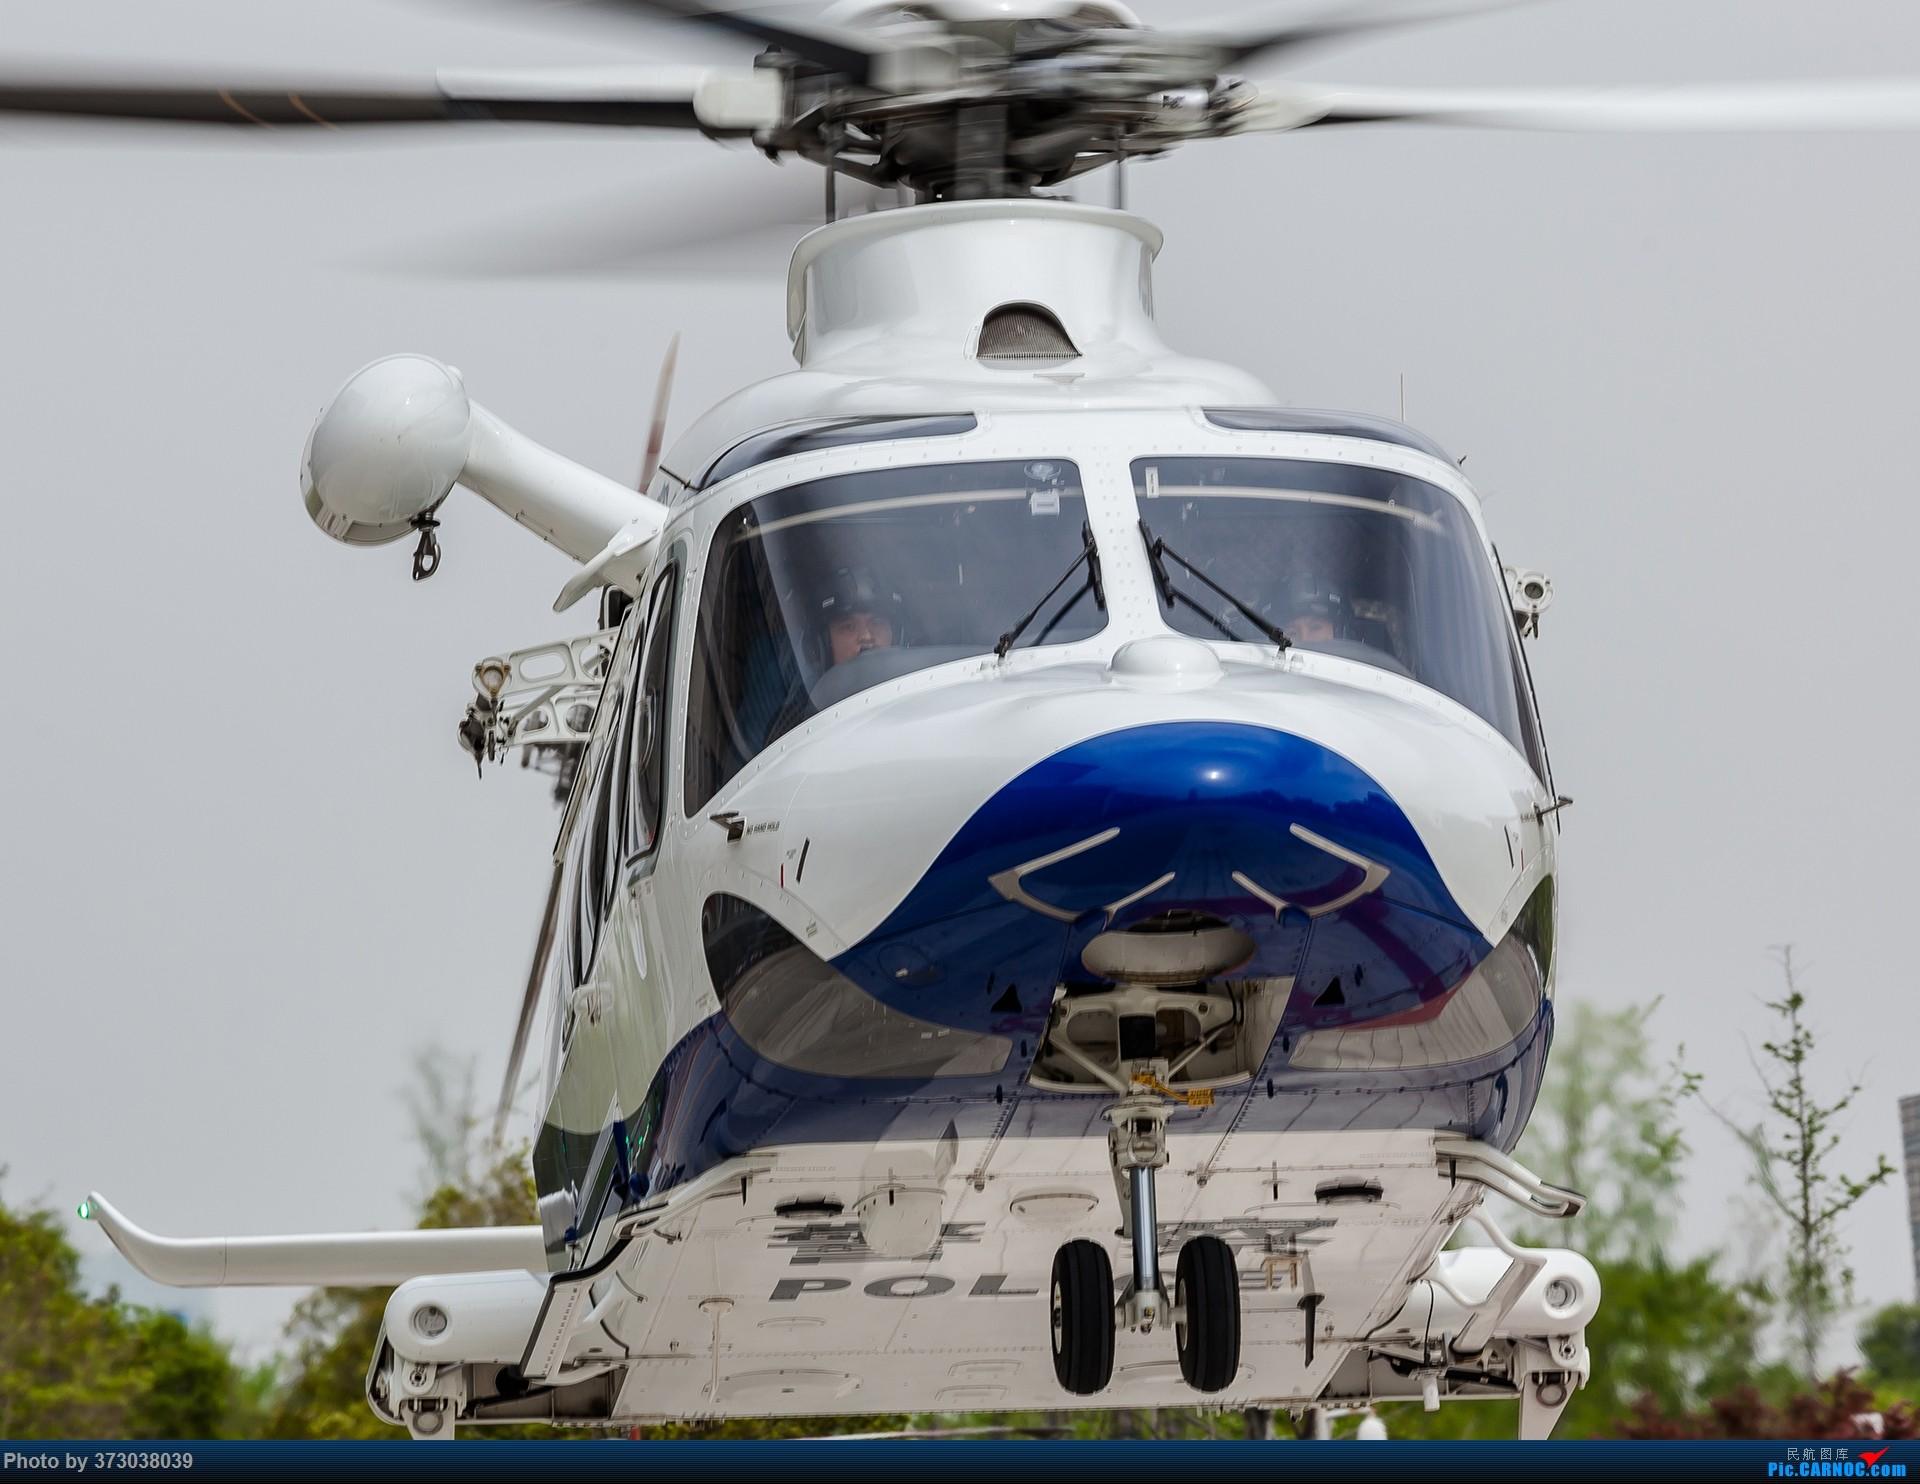 Re:【杭州飞友会】浙江警航主力直升机AW139 空中救援演习现场 AGUSTA AW139 33001 杭州下沙邵逸夫医院